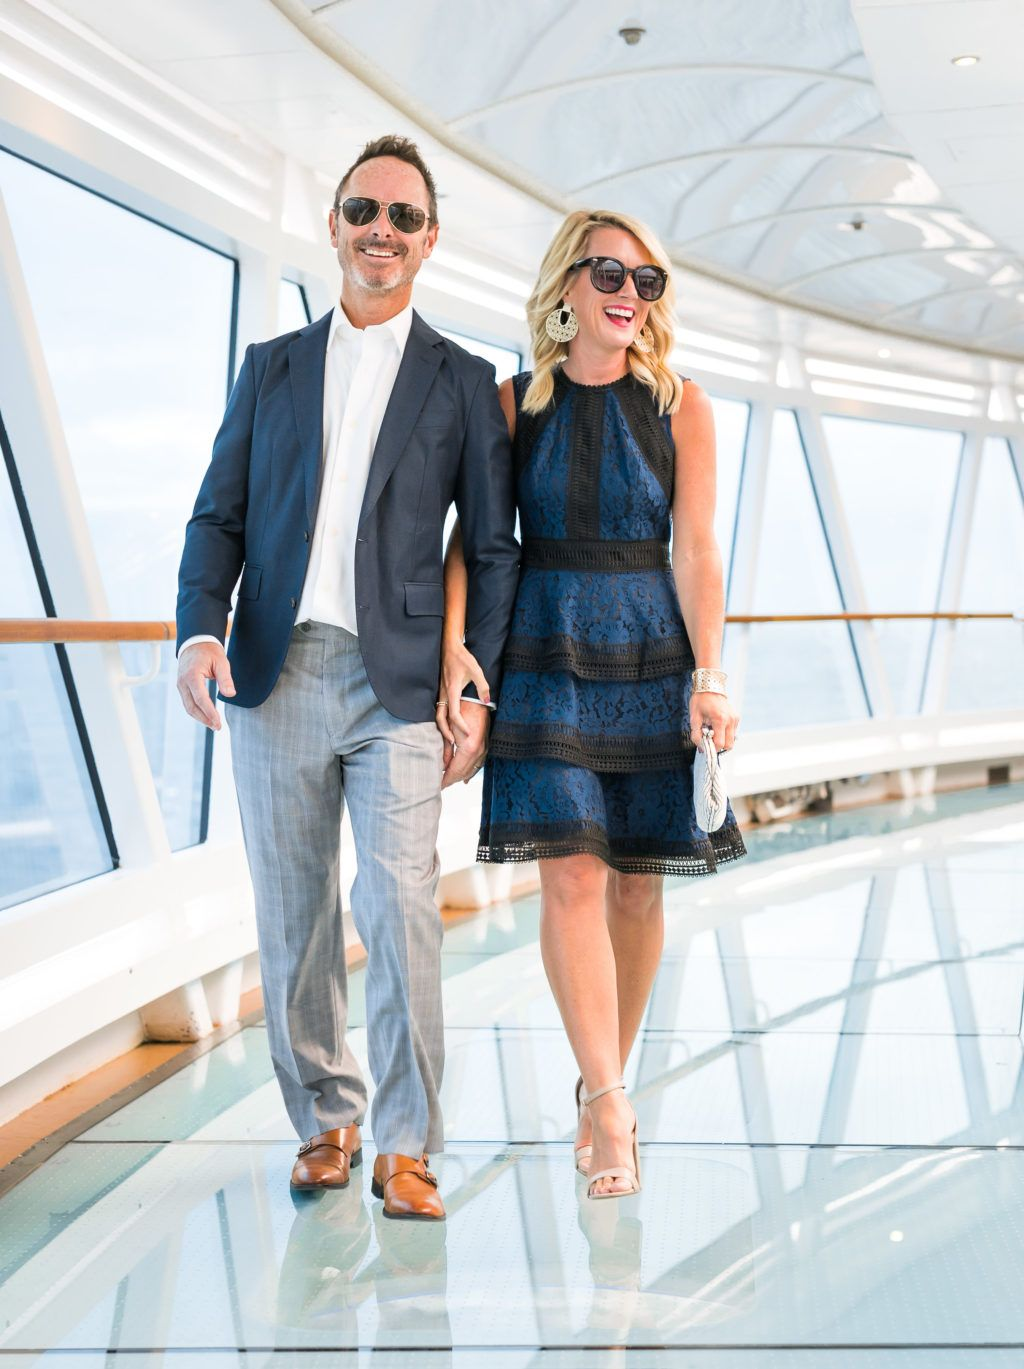 Date Night Cruise Style Hi Sugarplum Cruise Attire Cruise Dress Fashion